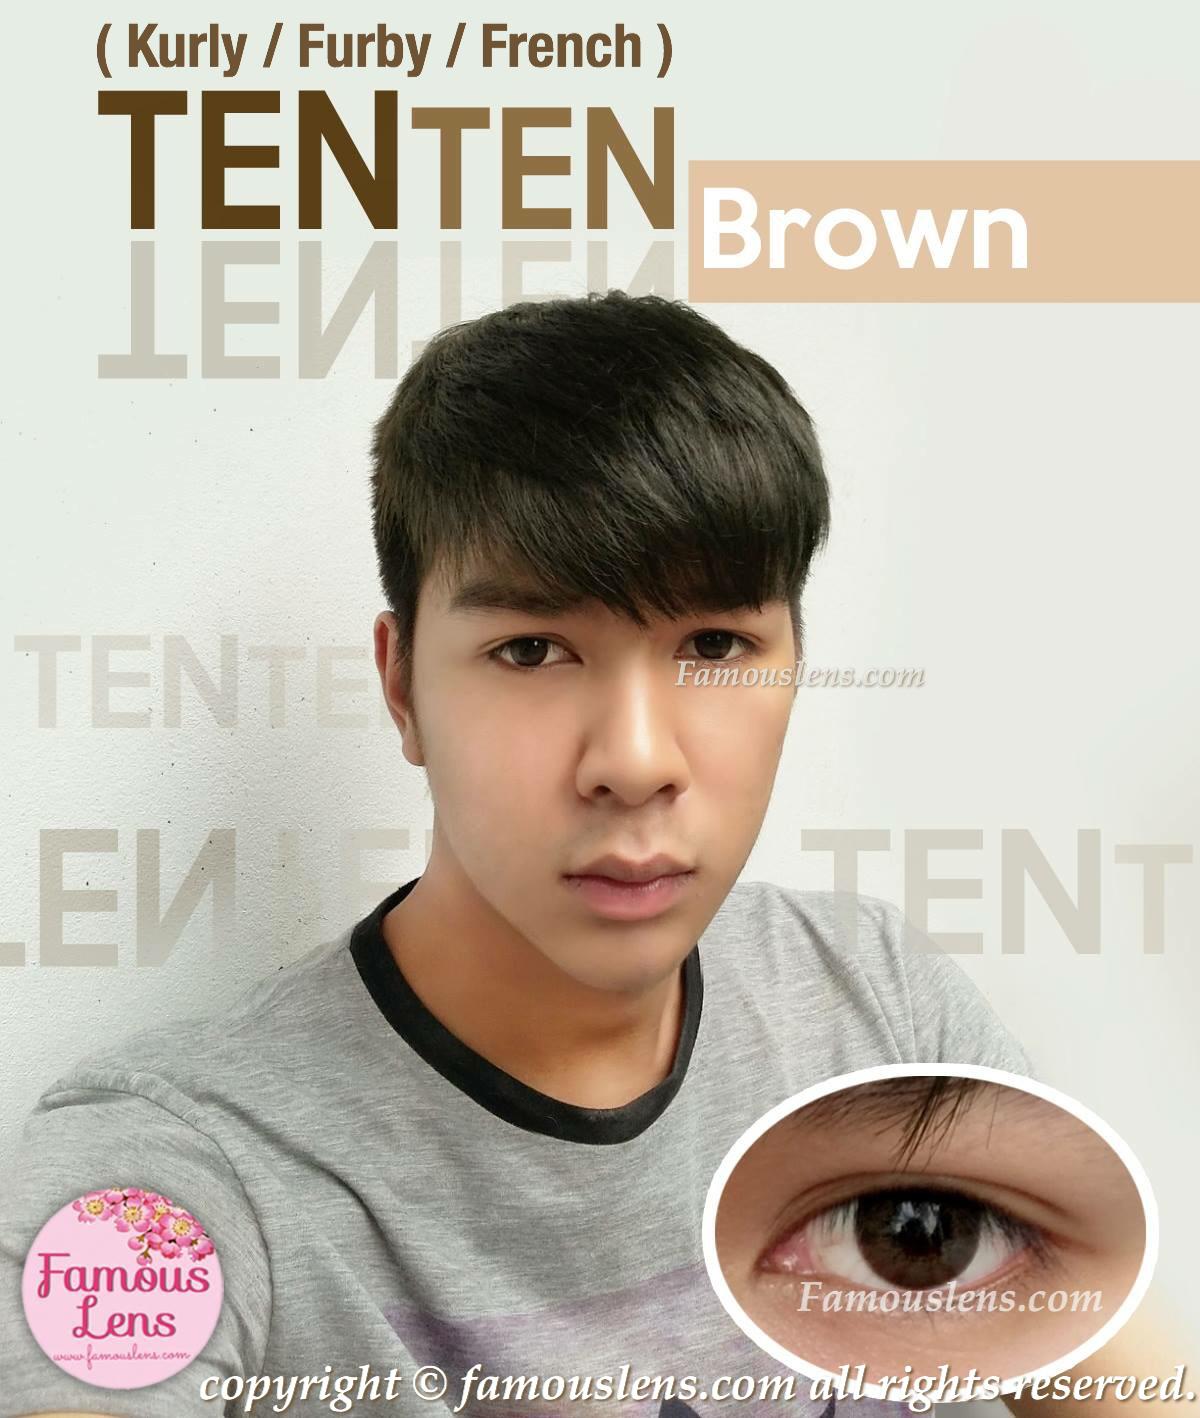 French Extra Brown Dia.14 คอนแทคเลนส์สำหรับผู้ชาย คอนแทคเลนส์สีน้ำตาลสวยๆขนาดเท่าตาจริง